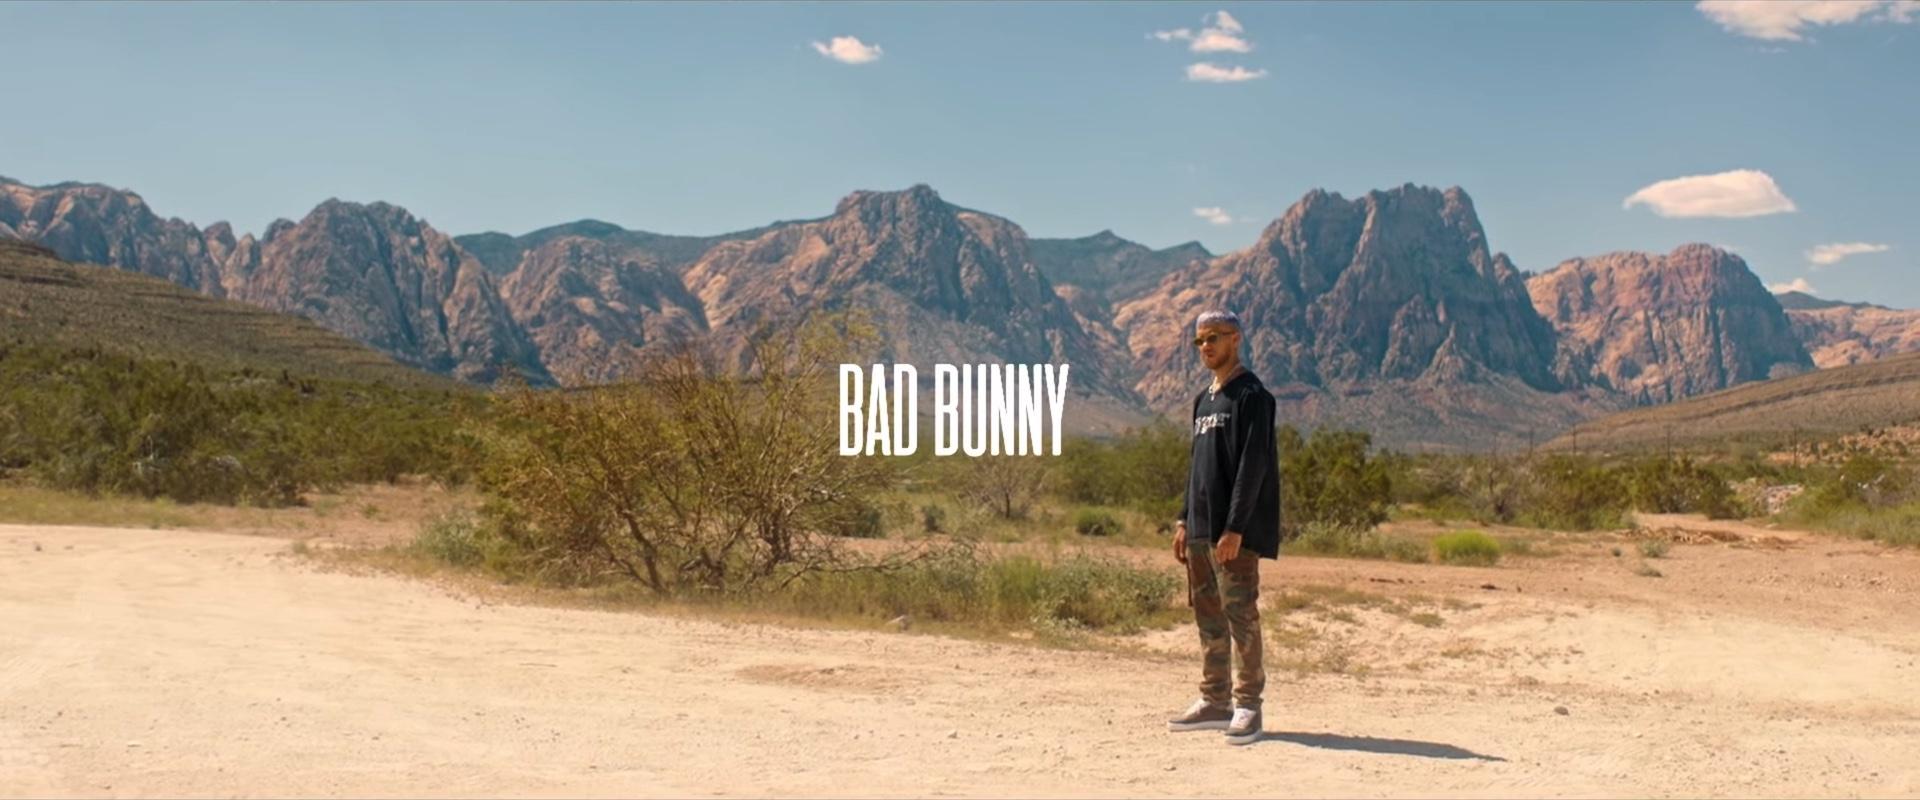 Quantum Arc Media_Bad Bunny_No Me Conoce_6